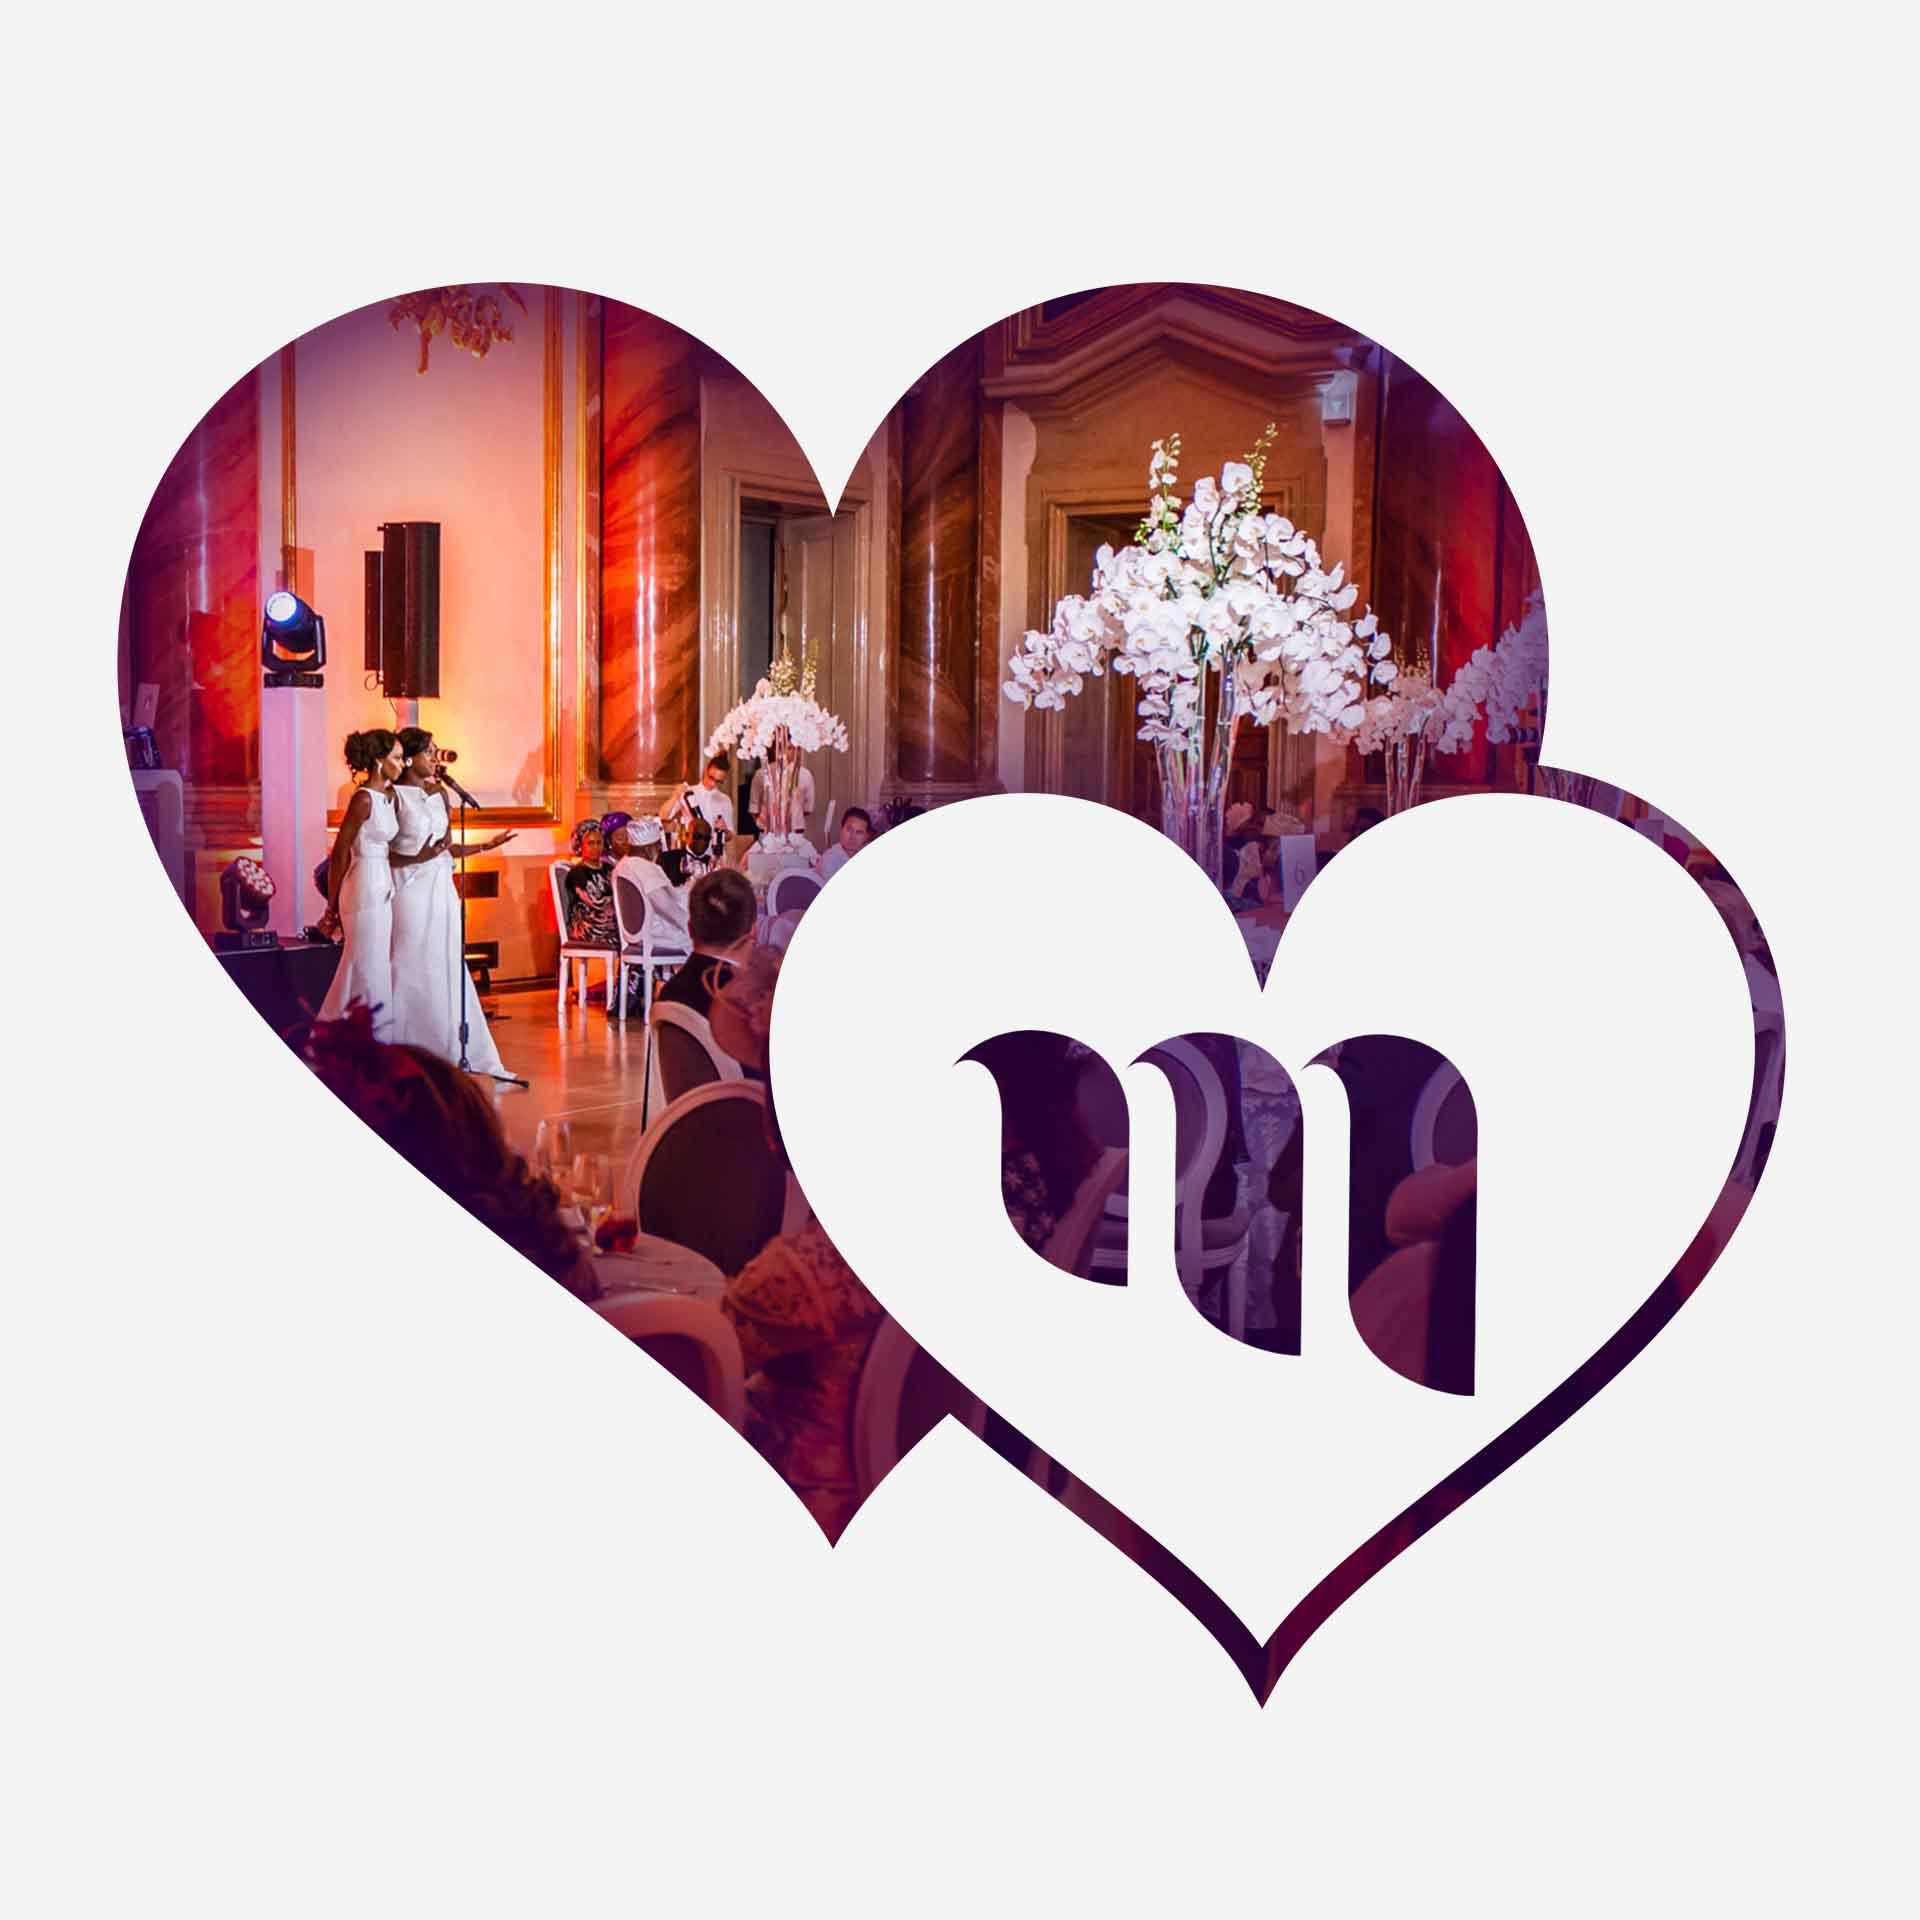 Oslava party svadba ples stuzkova Slovensko